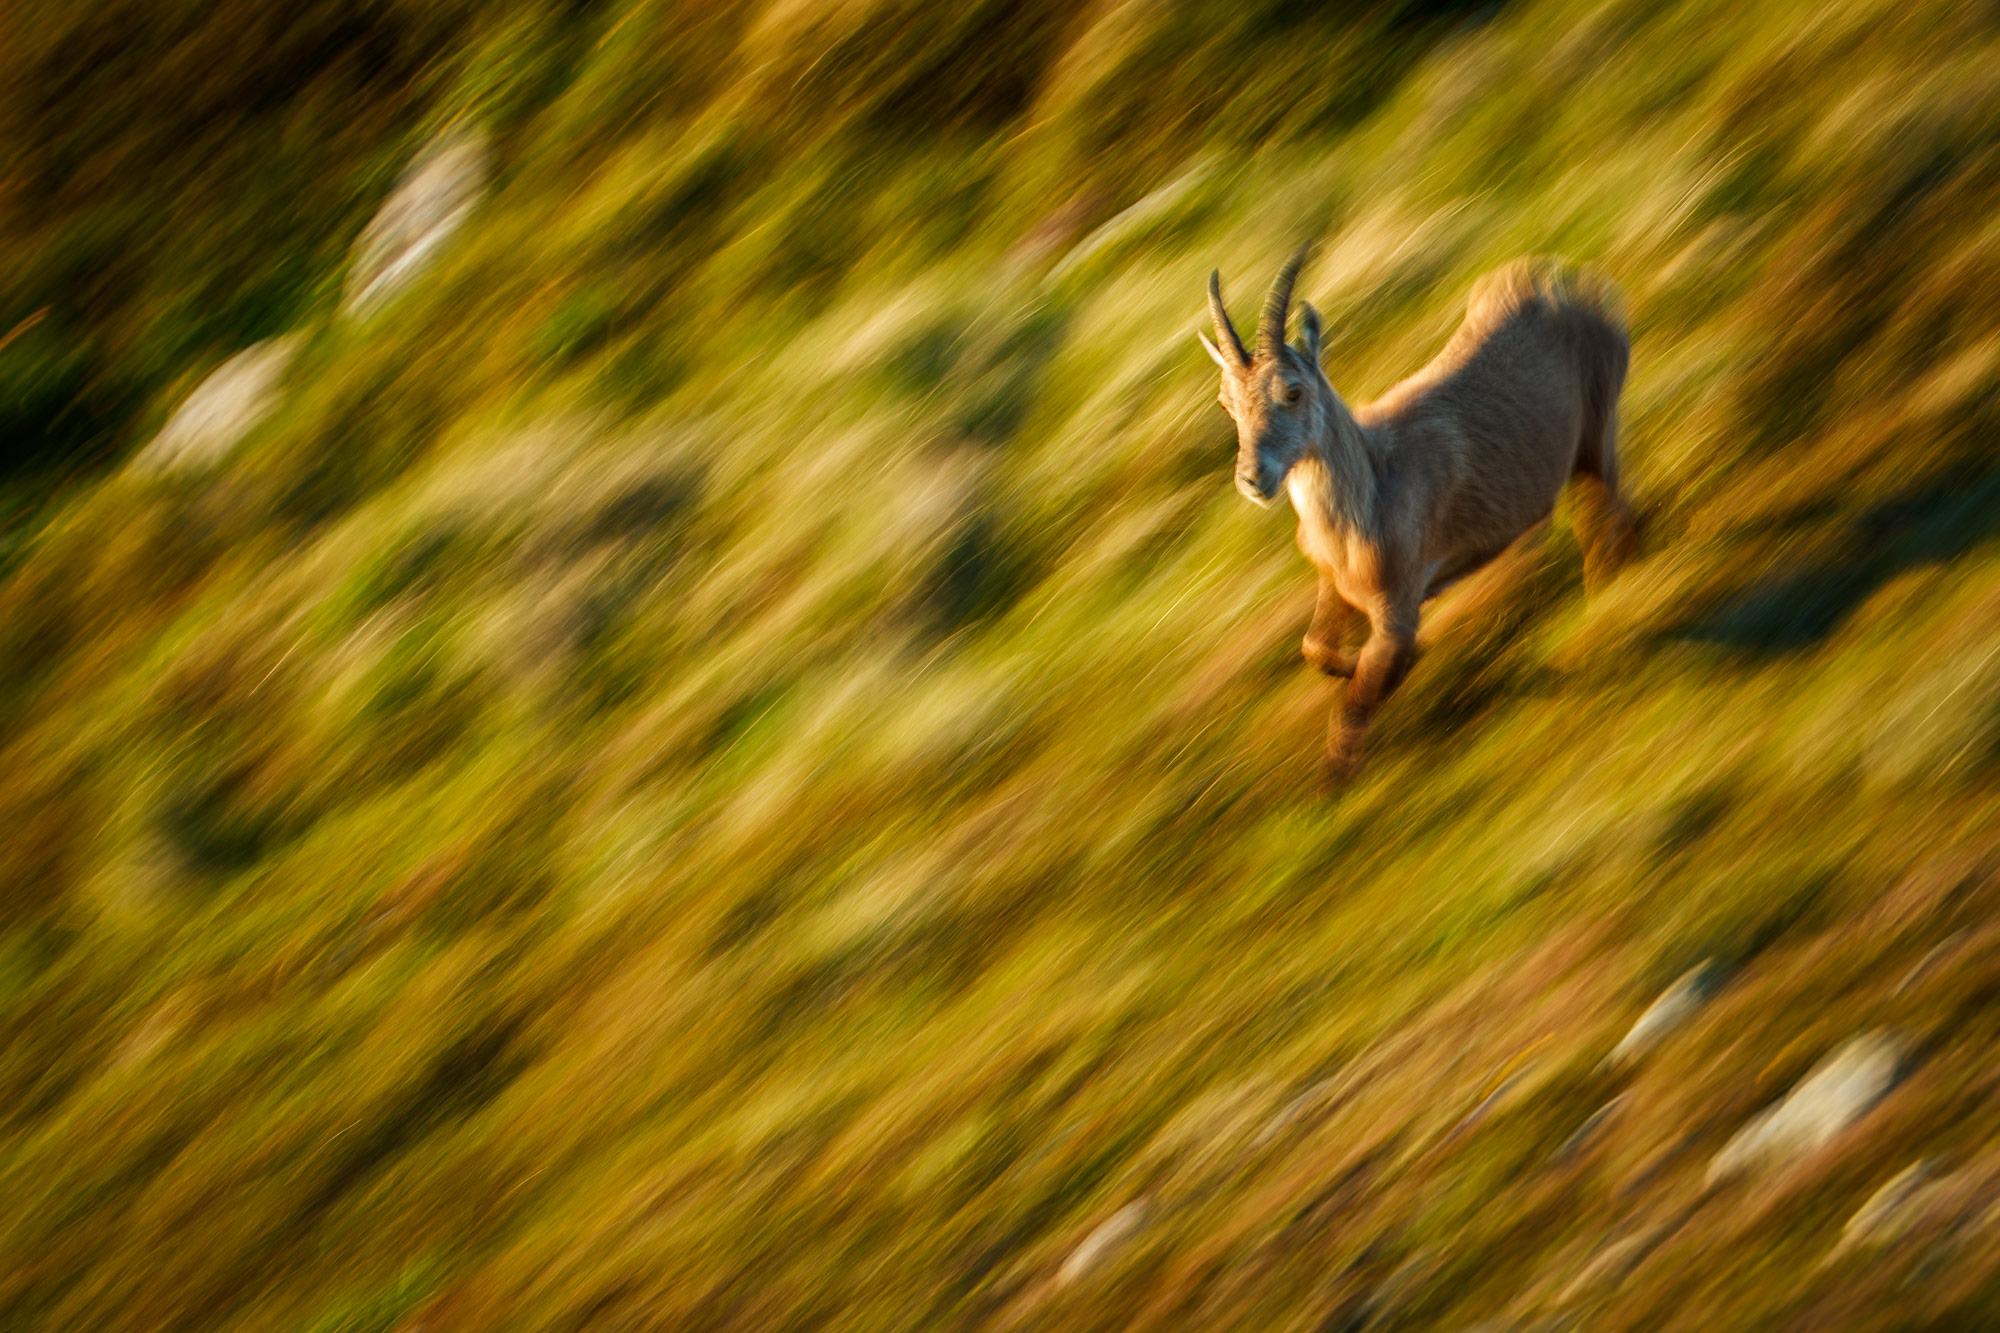 Tom_Schueler_Fotografie_Wildlife_Mammals_2